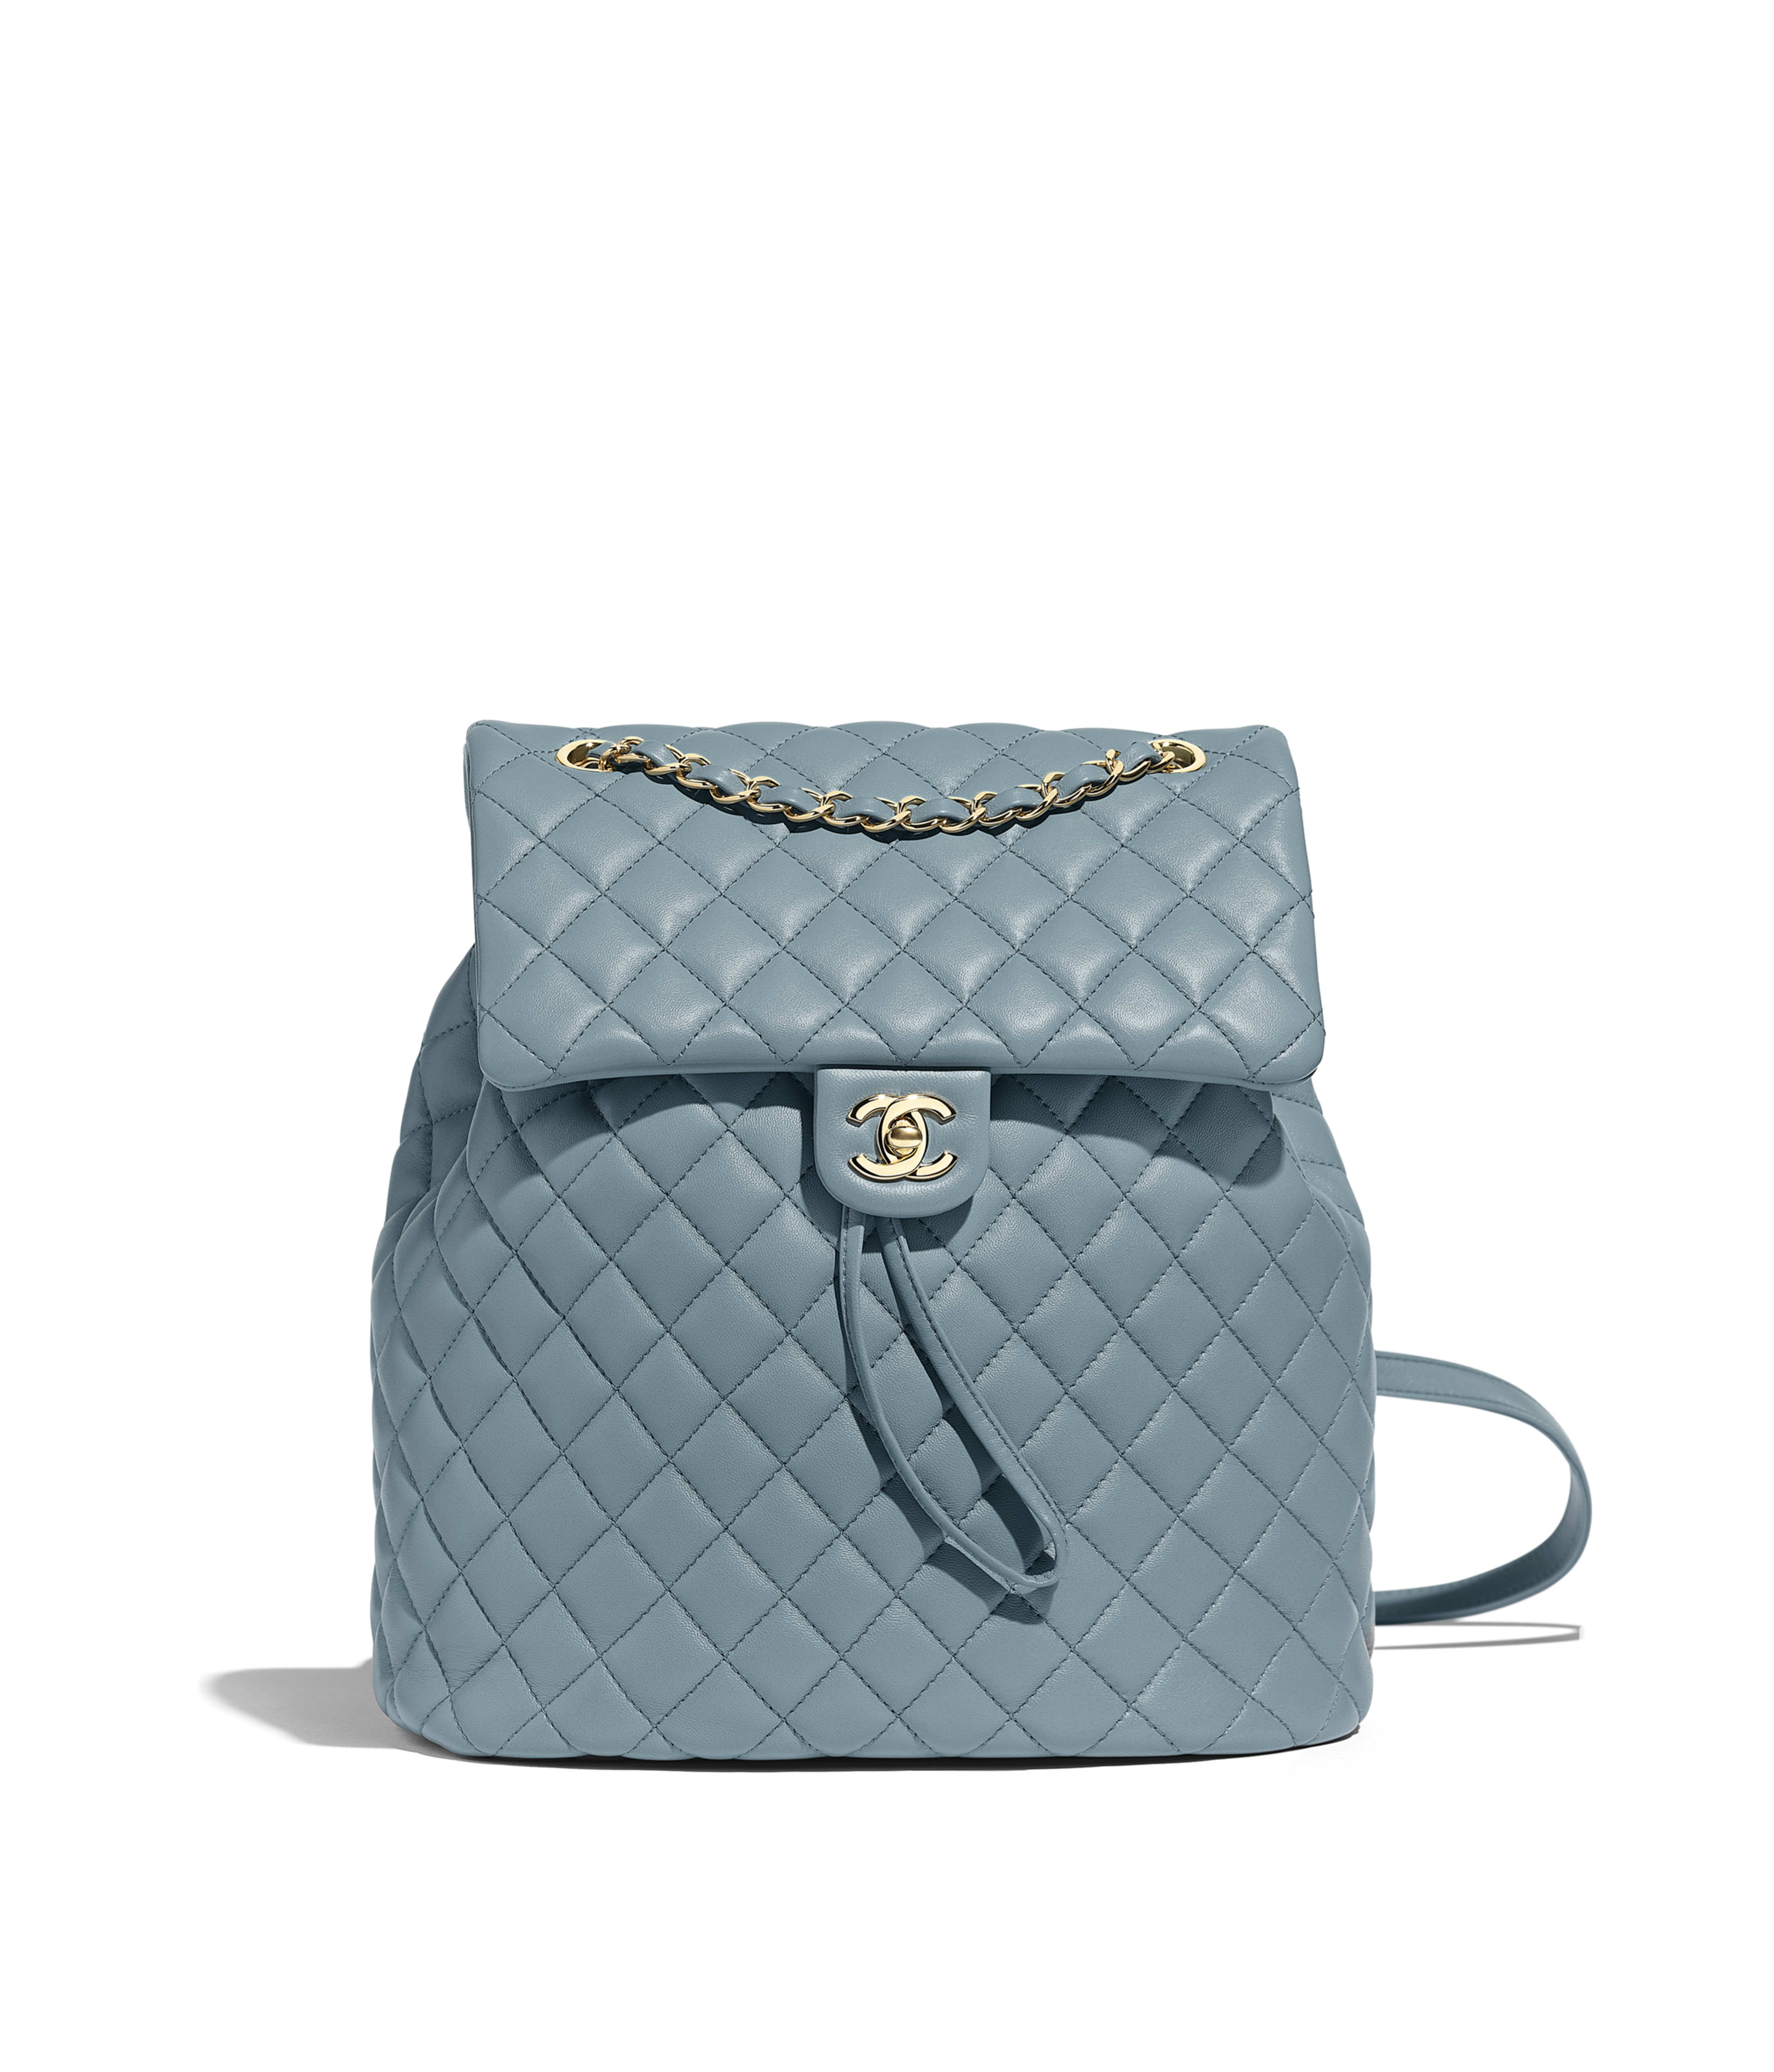 f0edf738b3c4 Backpack Lambskin & Gold-Tone Metal, Blue Ref. A91122B00250N0418